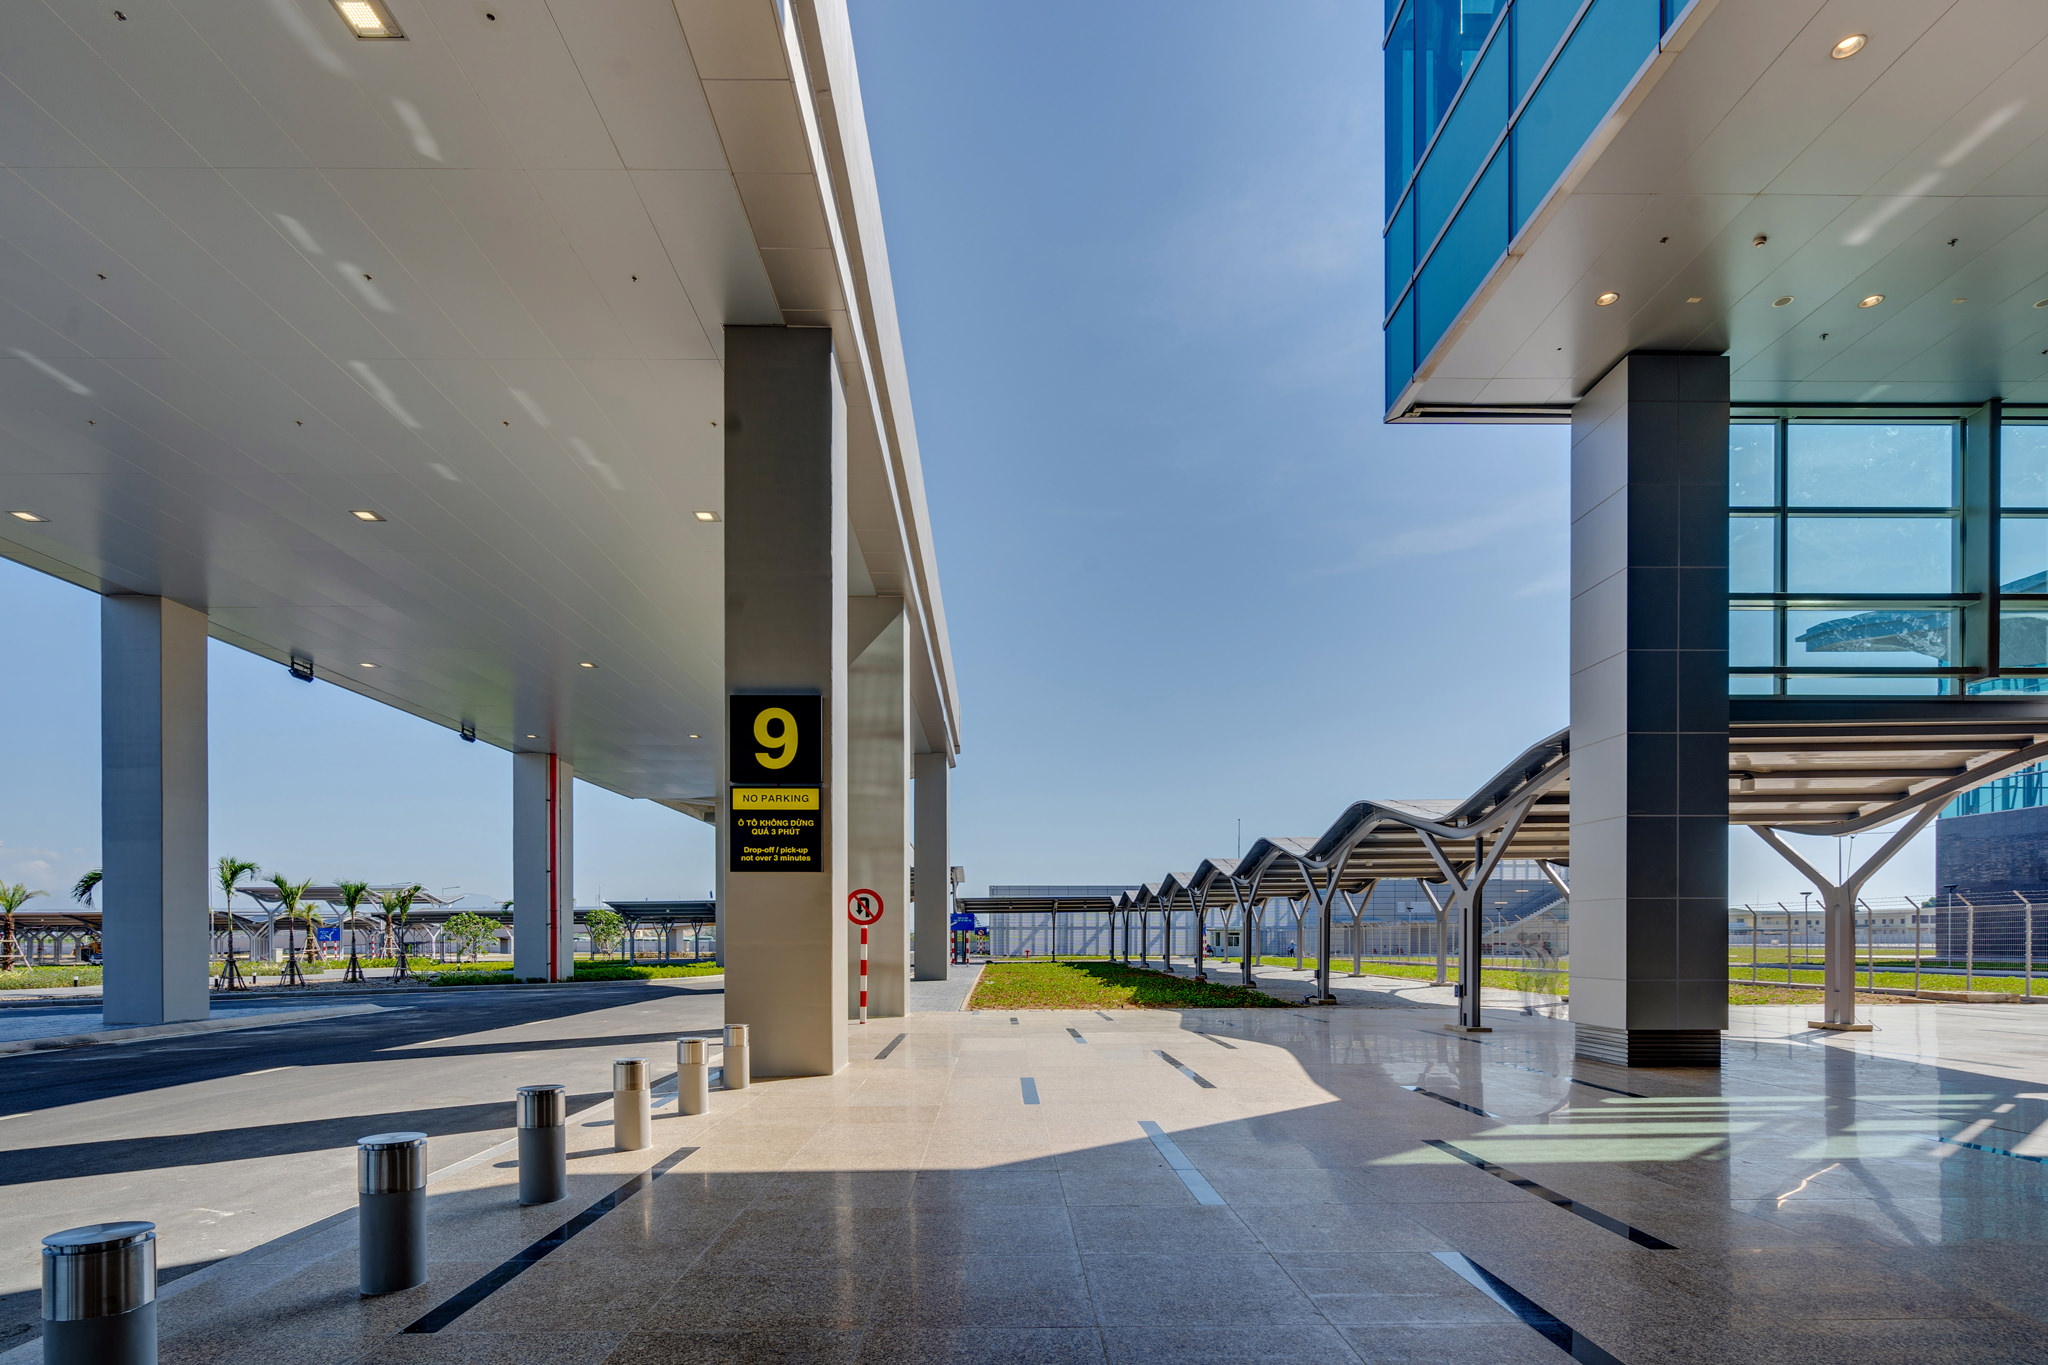 20180626 - Cam Ranh Airport - Architecture - 0218.jpg